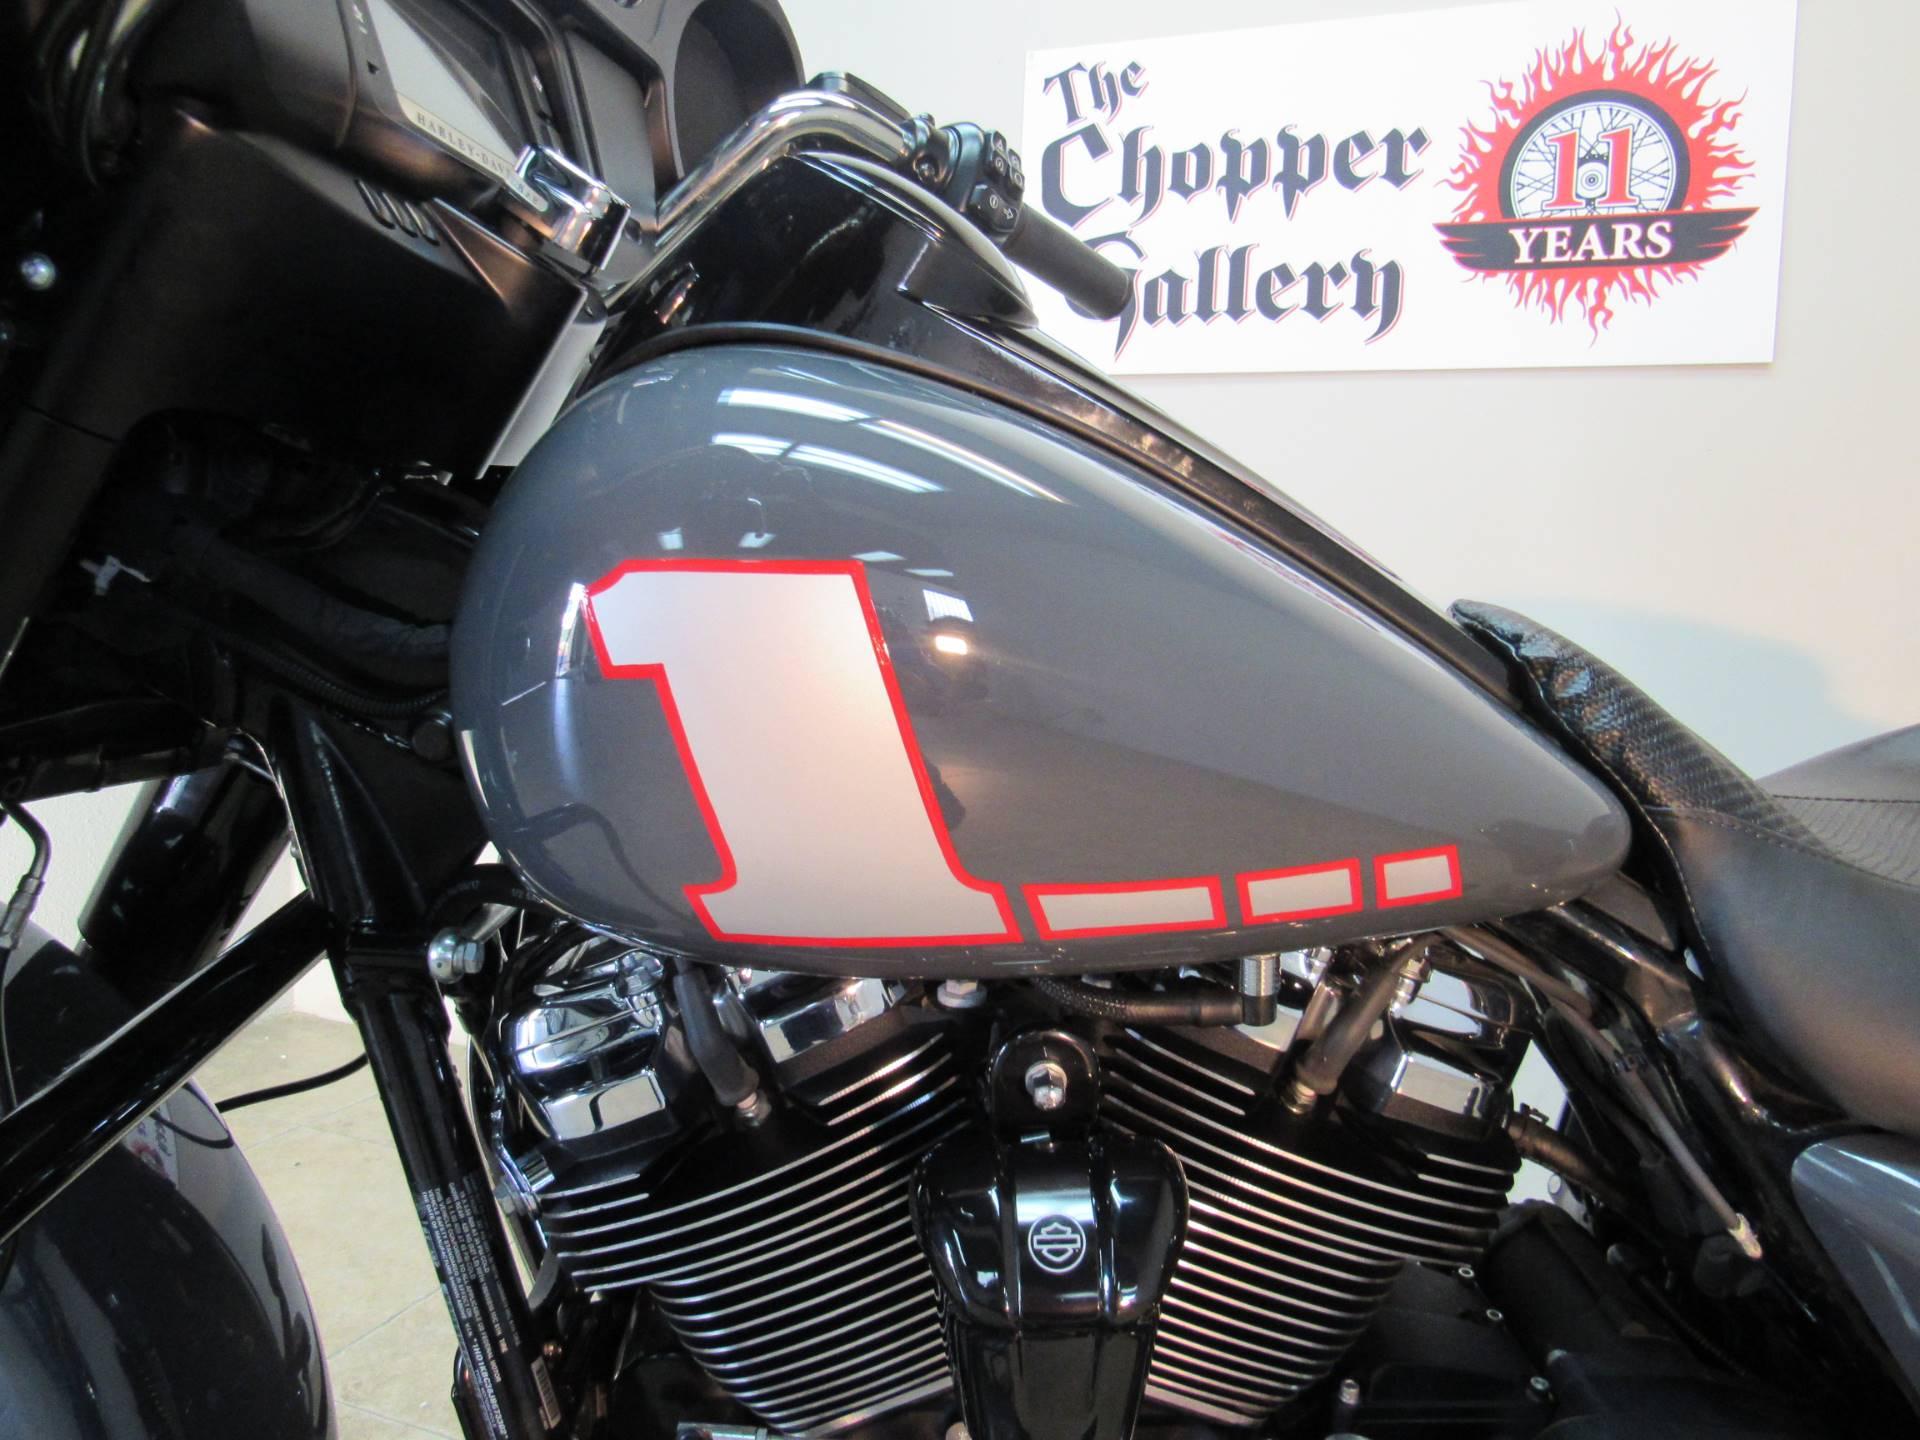 2018 Harley-Davidson Street Glide Special 5